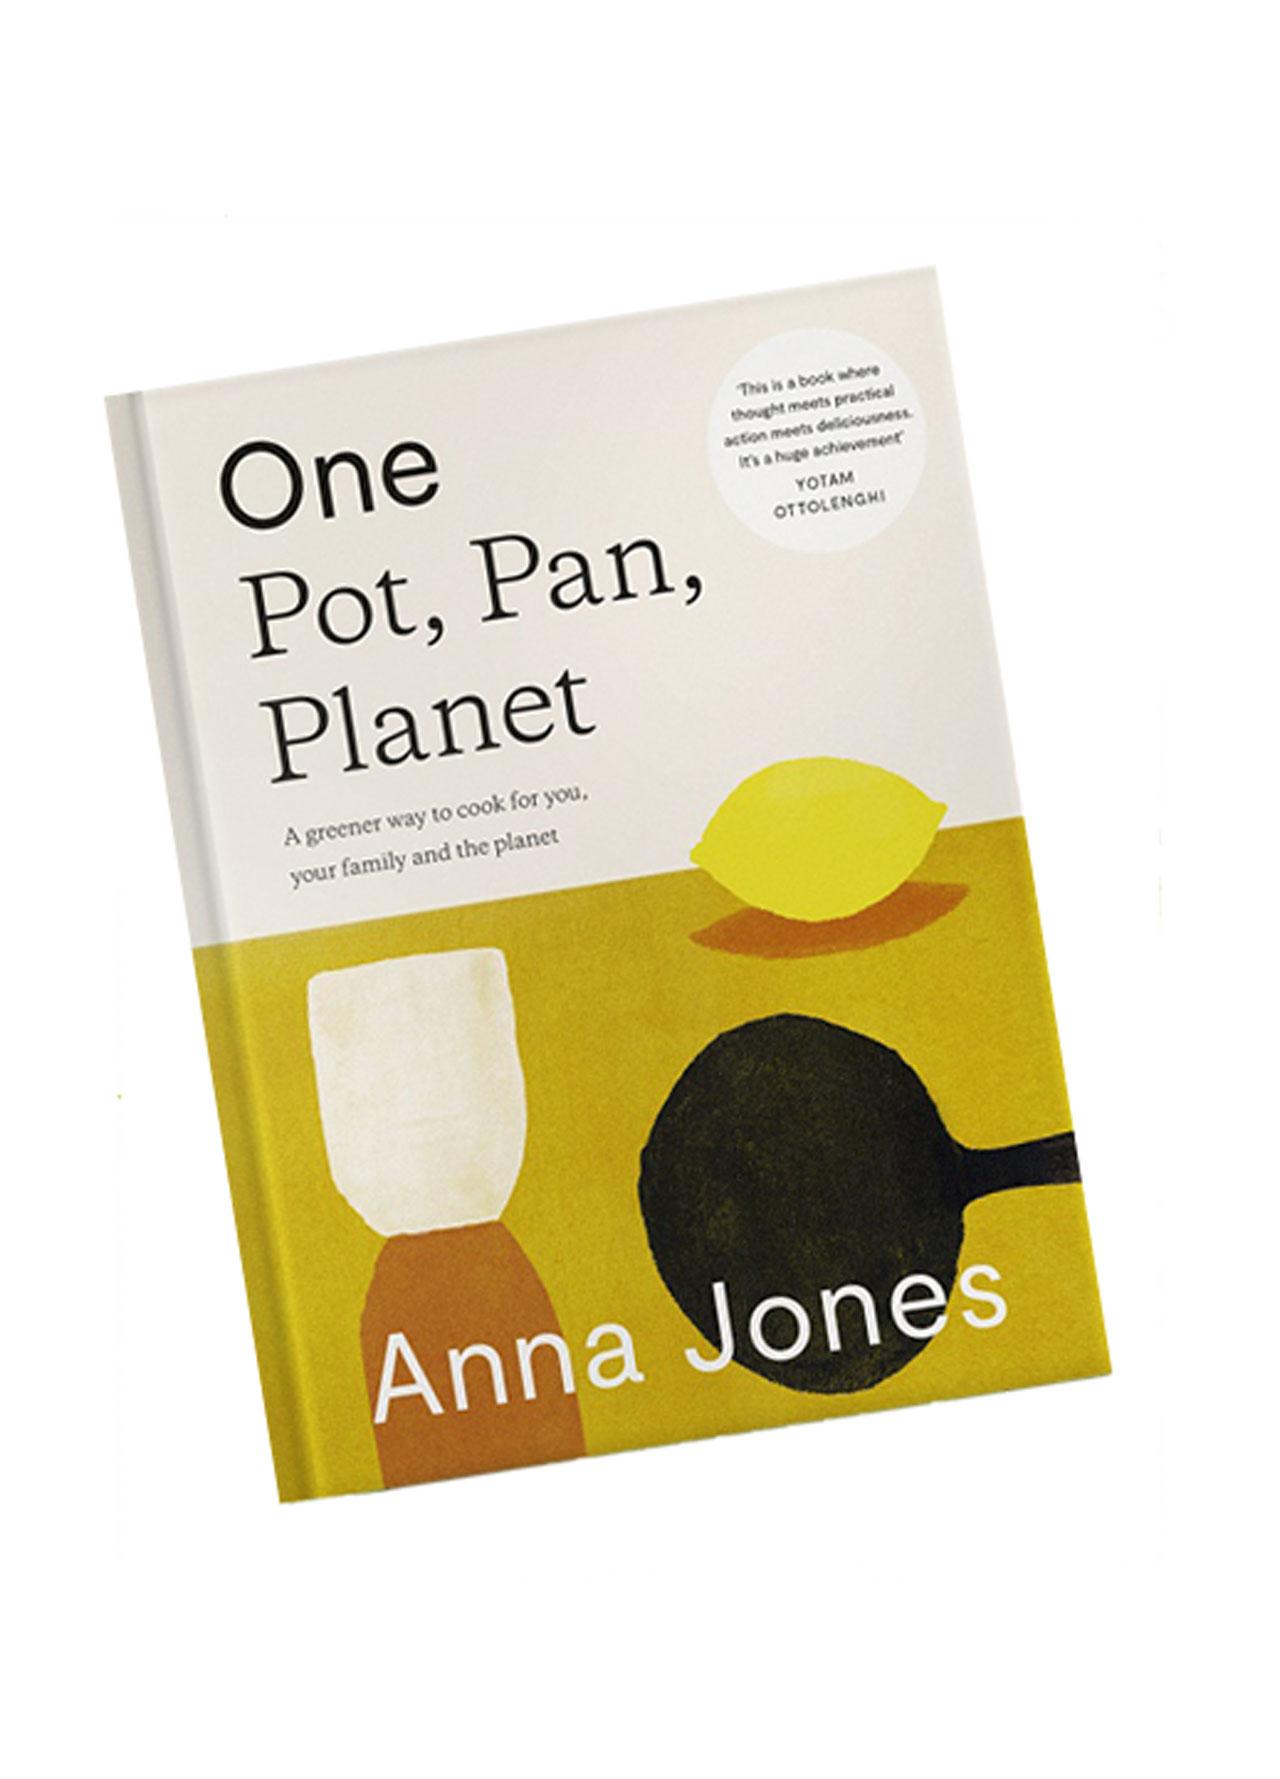 Anna Jones – One Pot, Pan, Planet